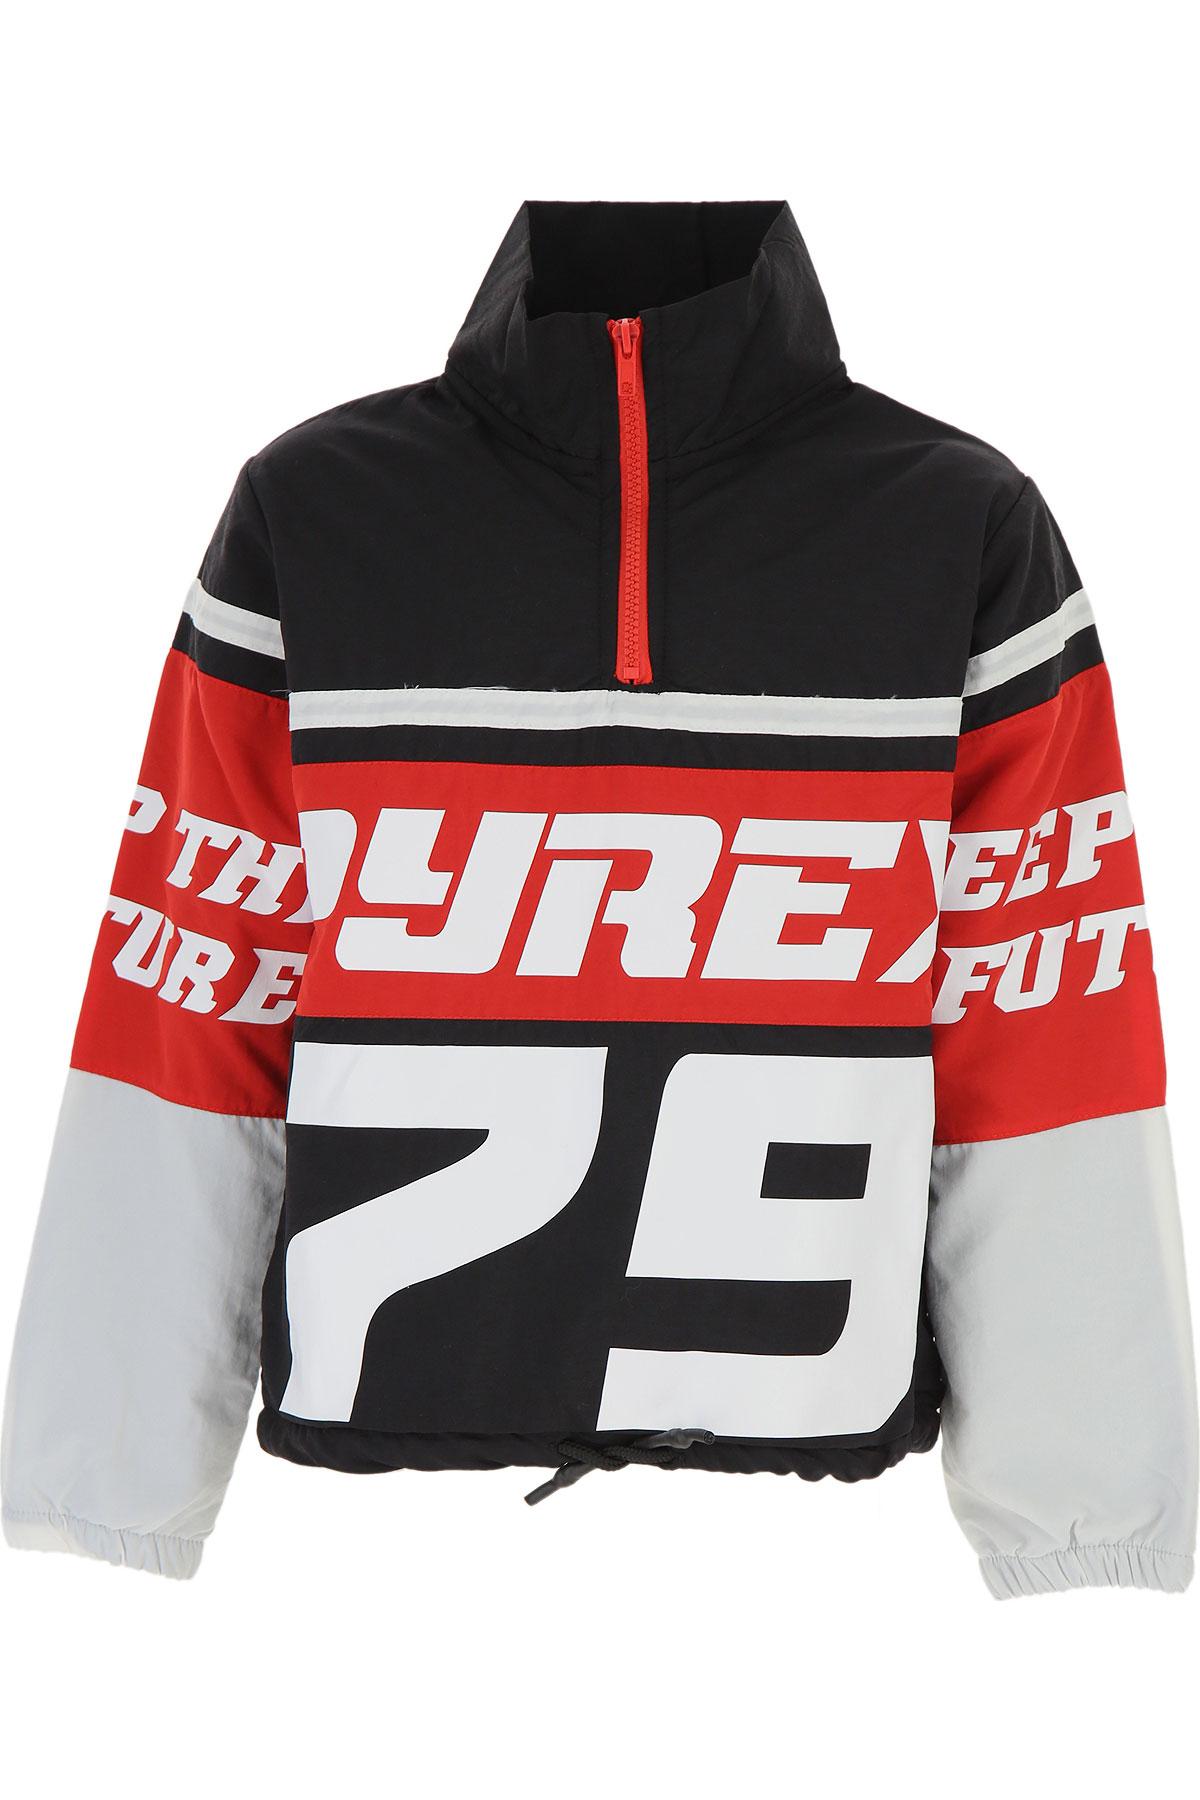 Pyrex Kids Sweatshirts & Hoodies for Boys On Sale, Black, polyester, 2019, L M XL XS XXL (16 Y)